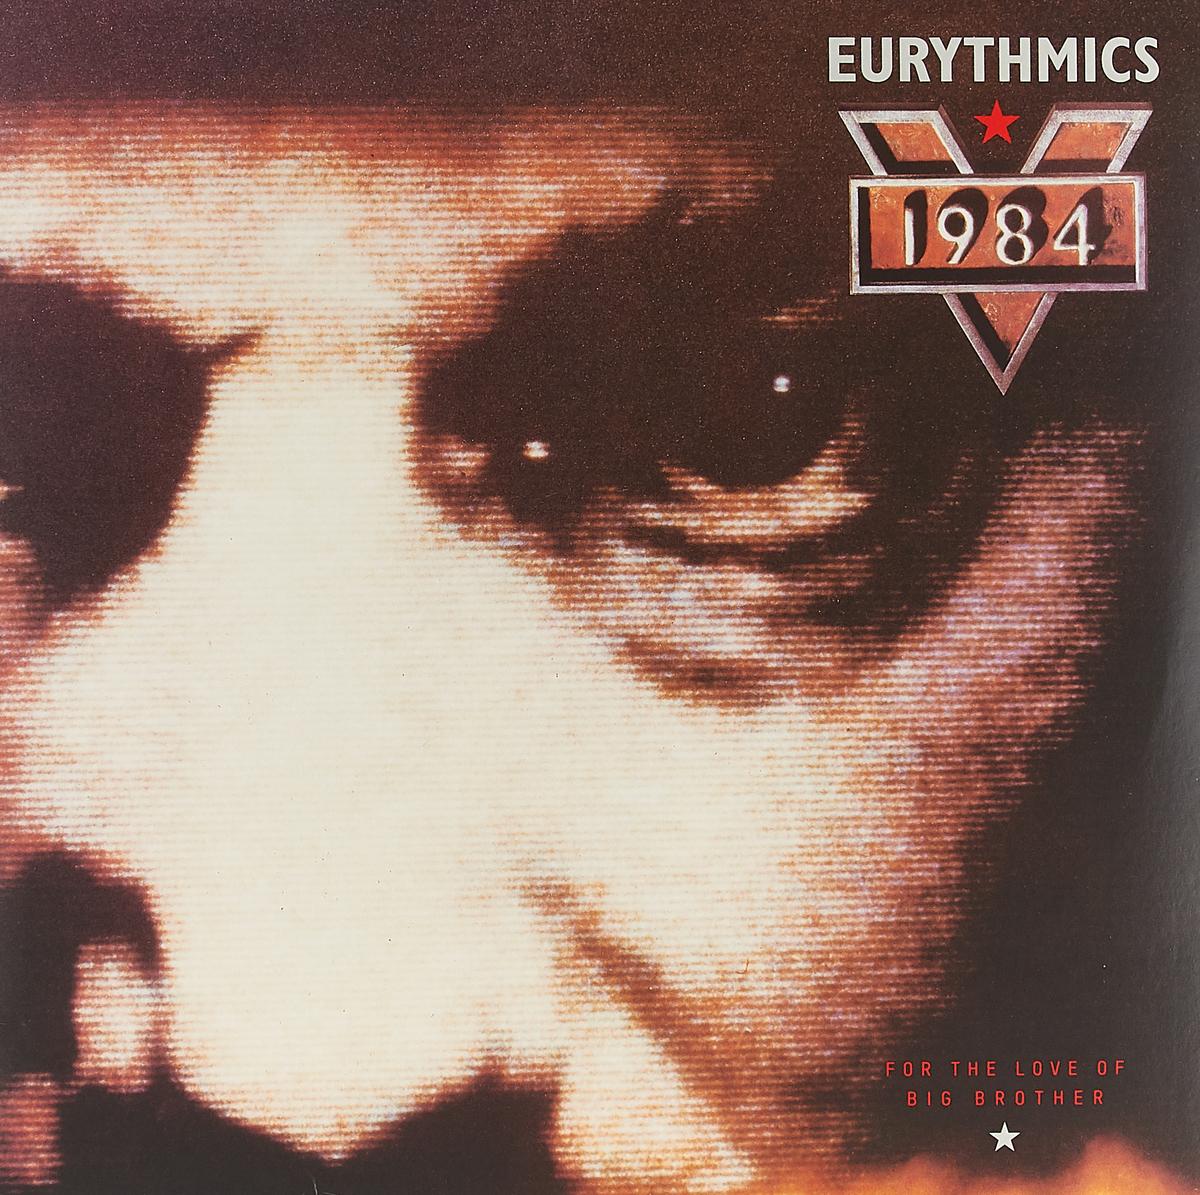 Фото - Eurythmics Eurythmics. 1984 (LP) eurythmics eurythmics greatest hits 2 lp